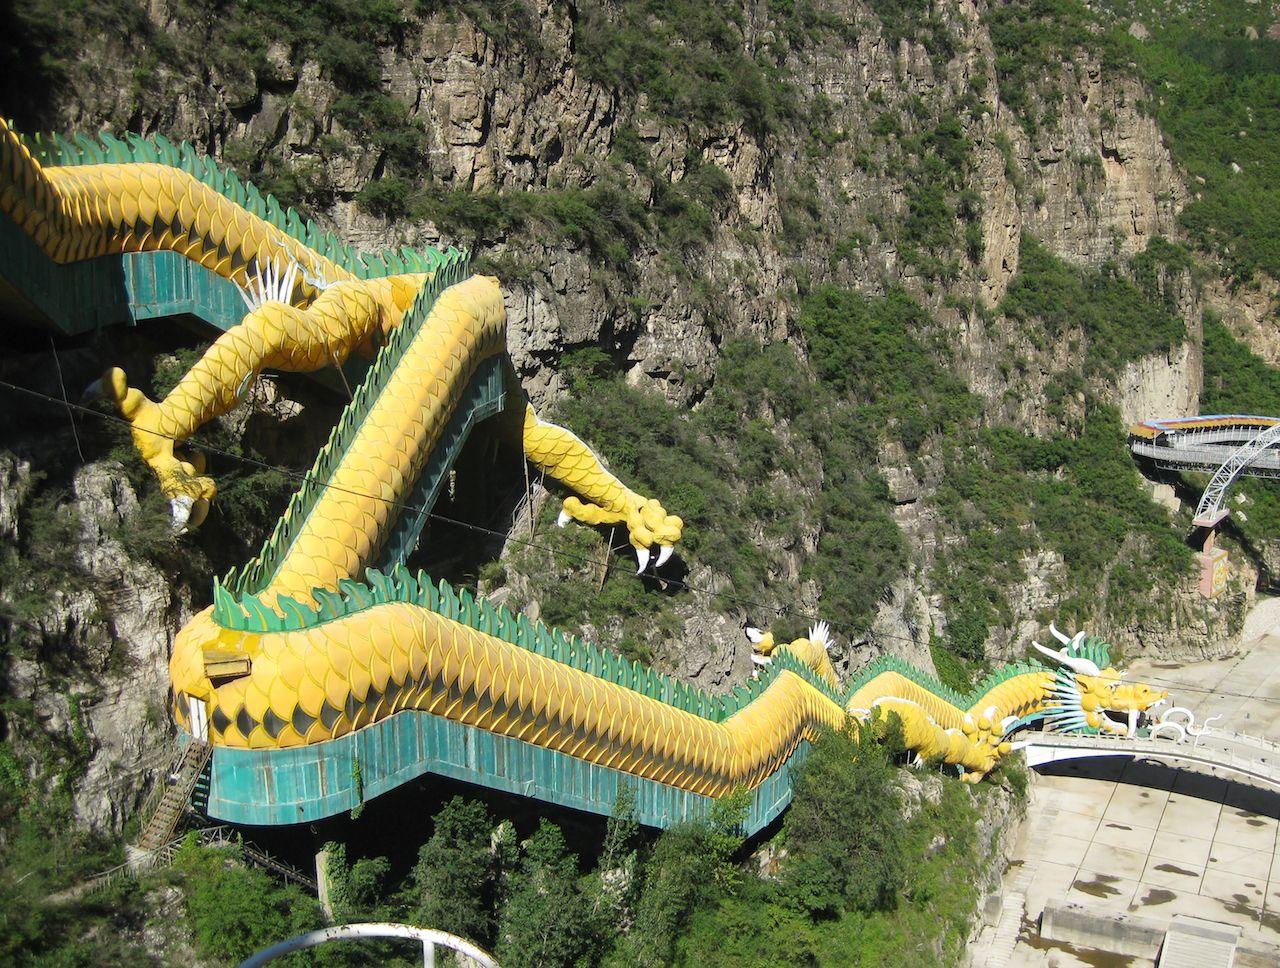 Longqing Dragon Escalator Gorge